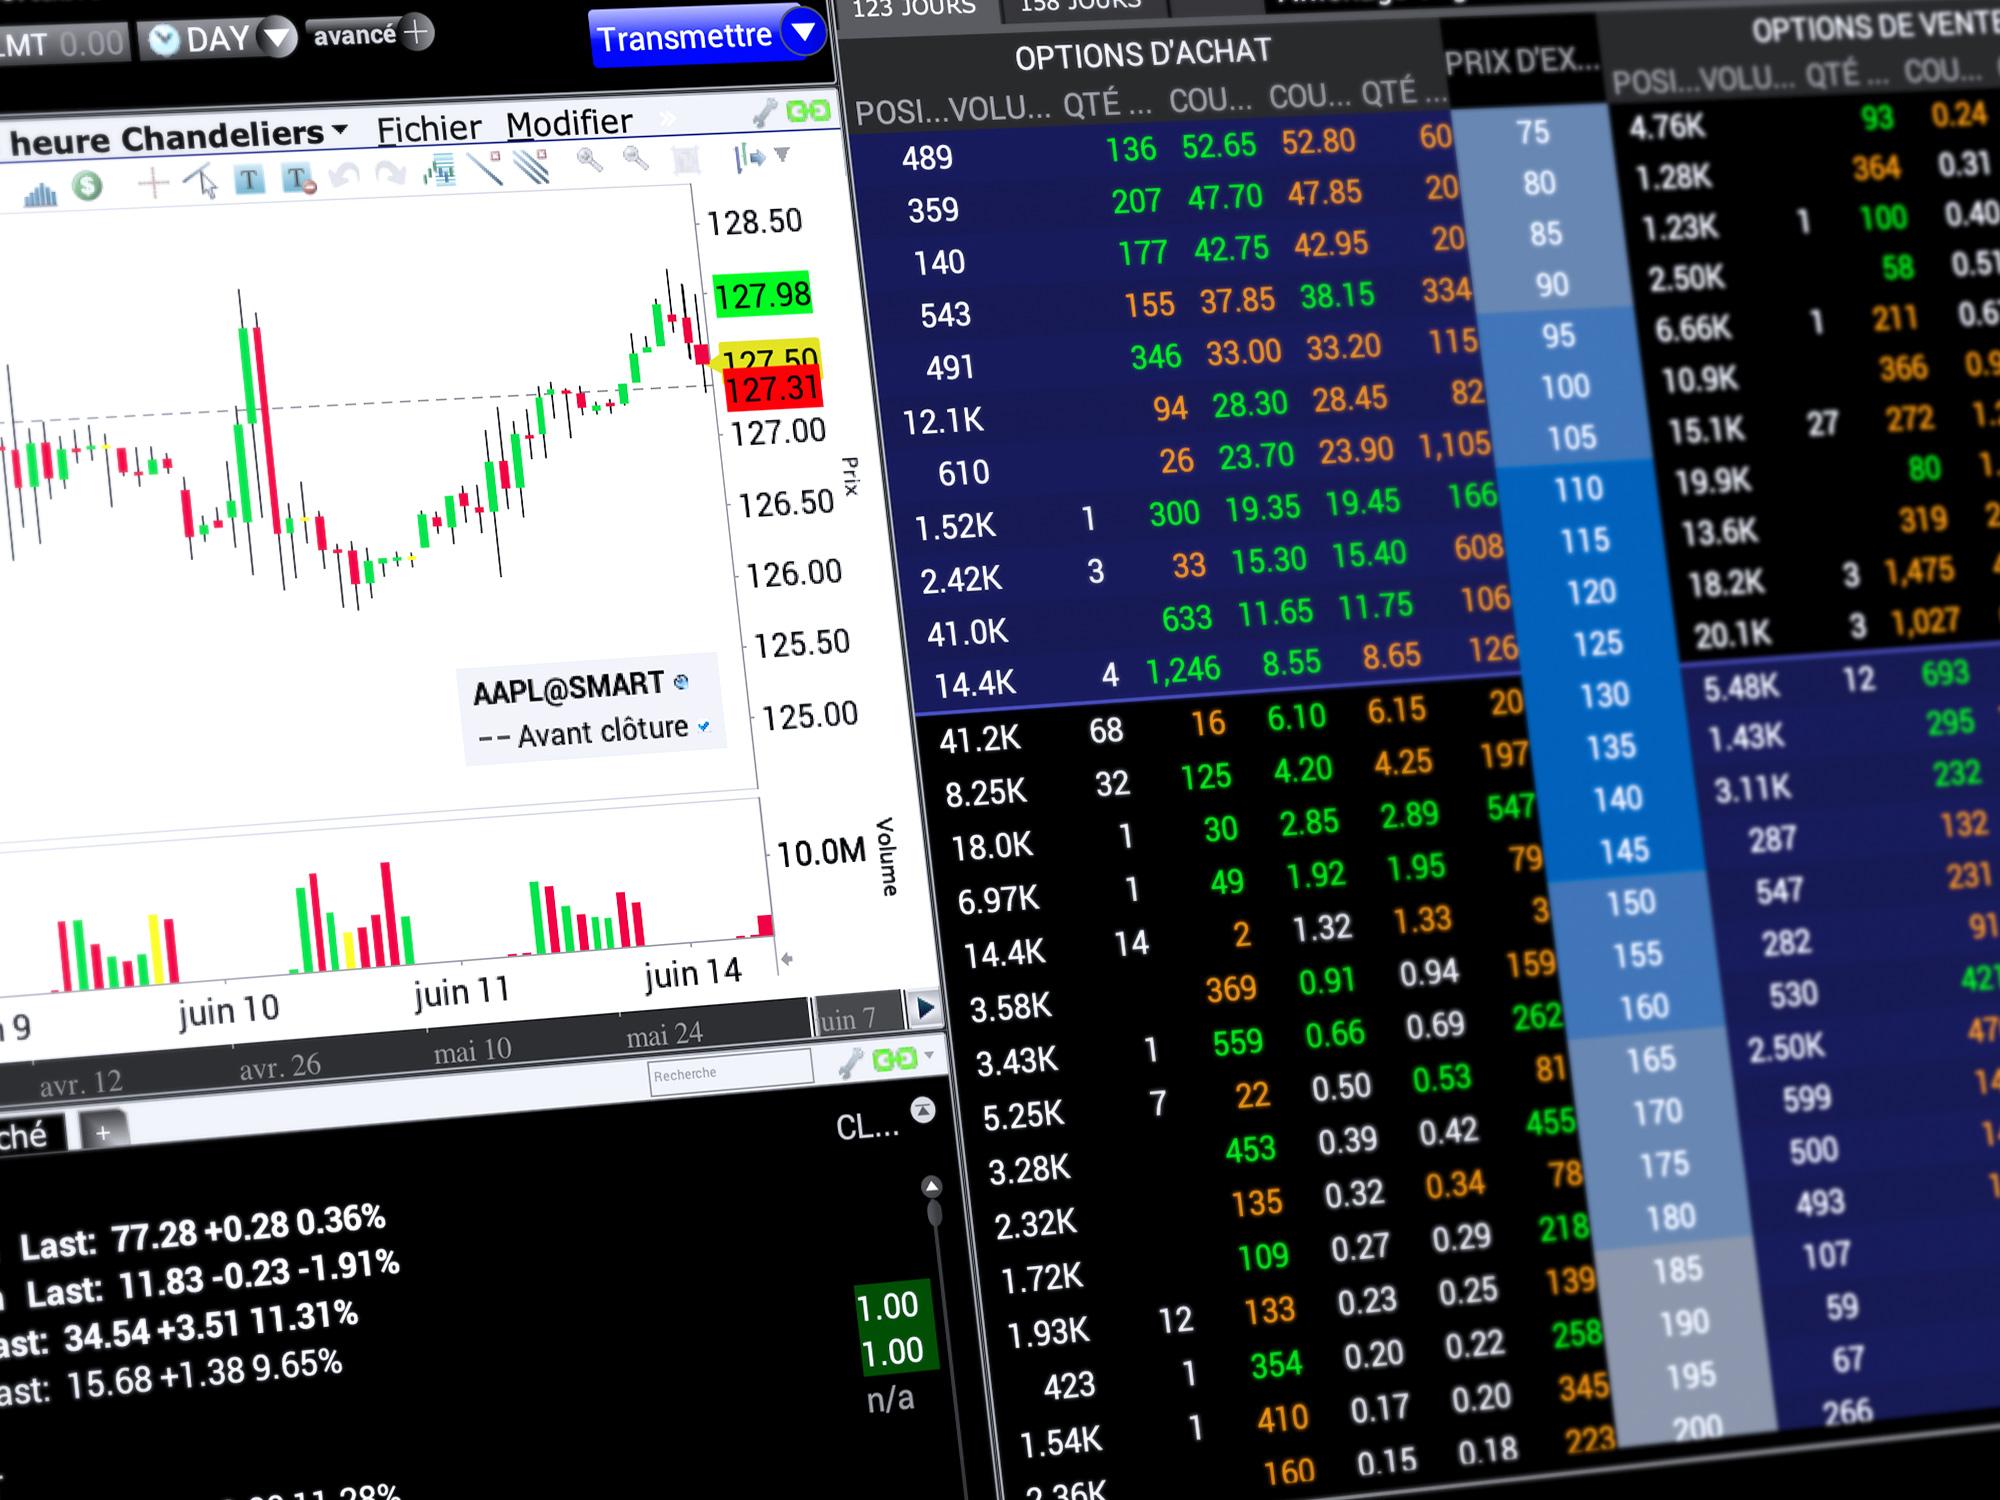 Plateforme de trading TWS Mosaic